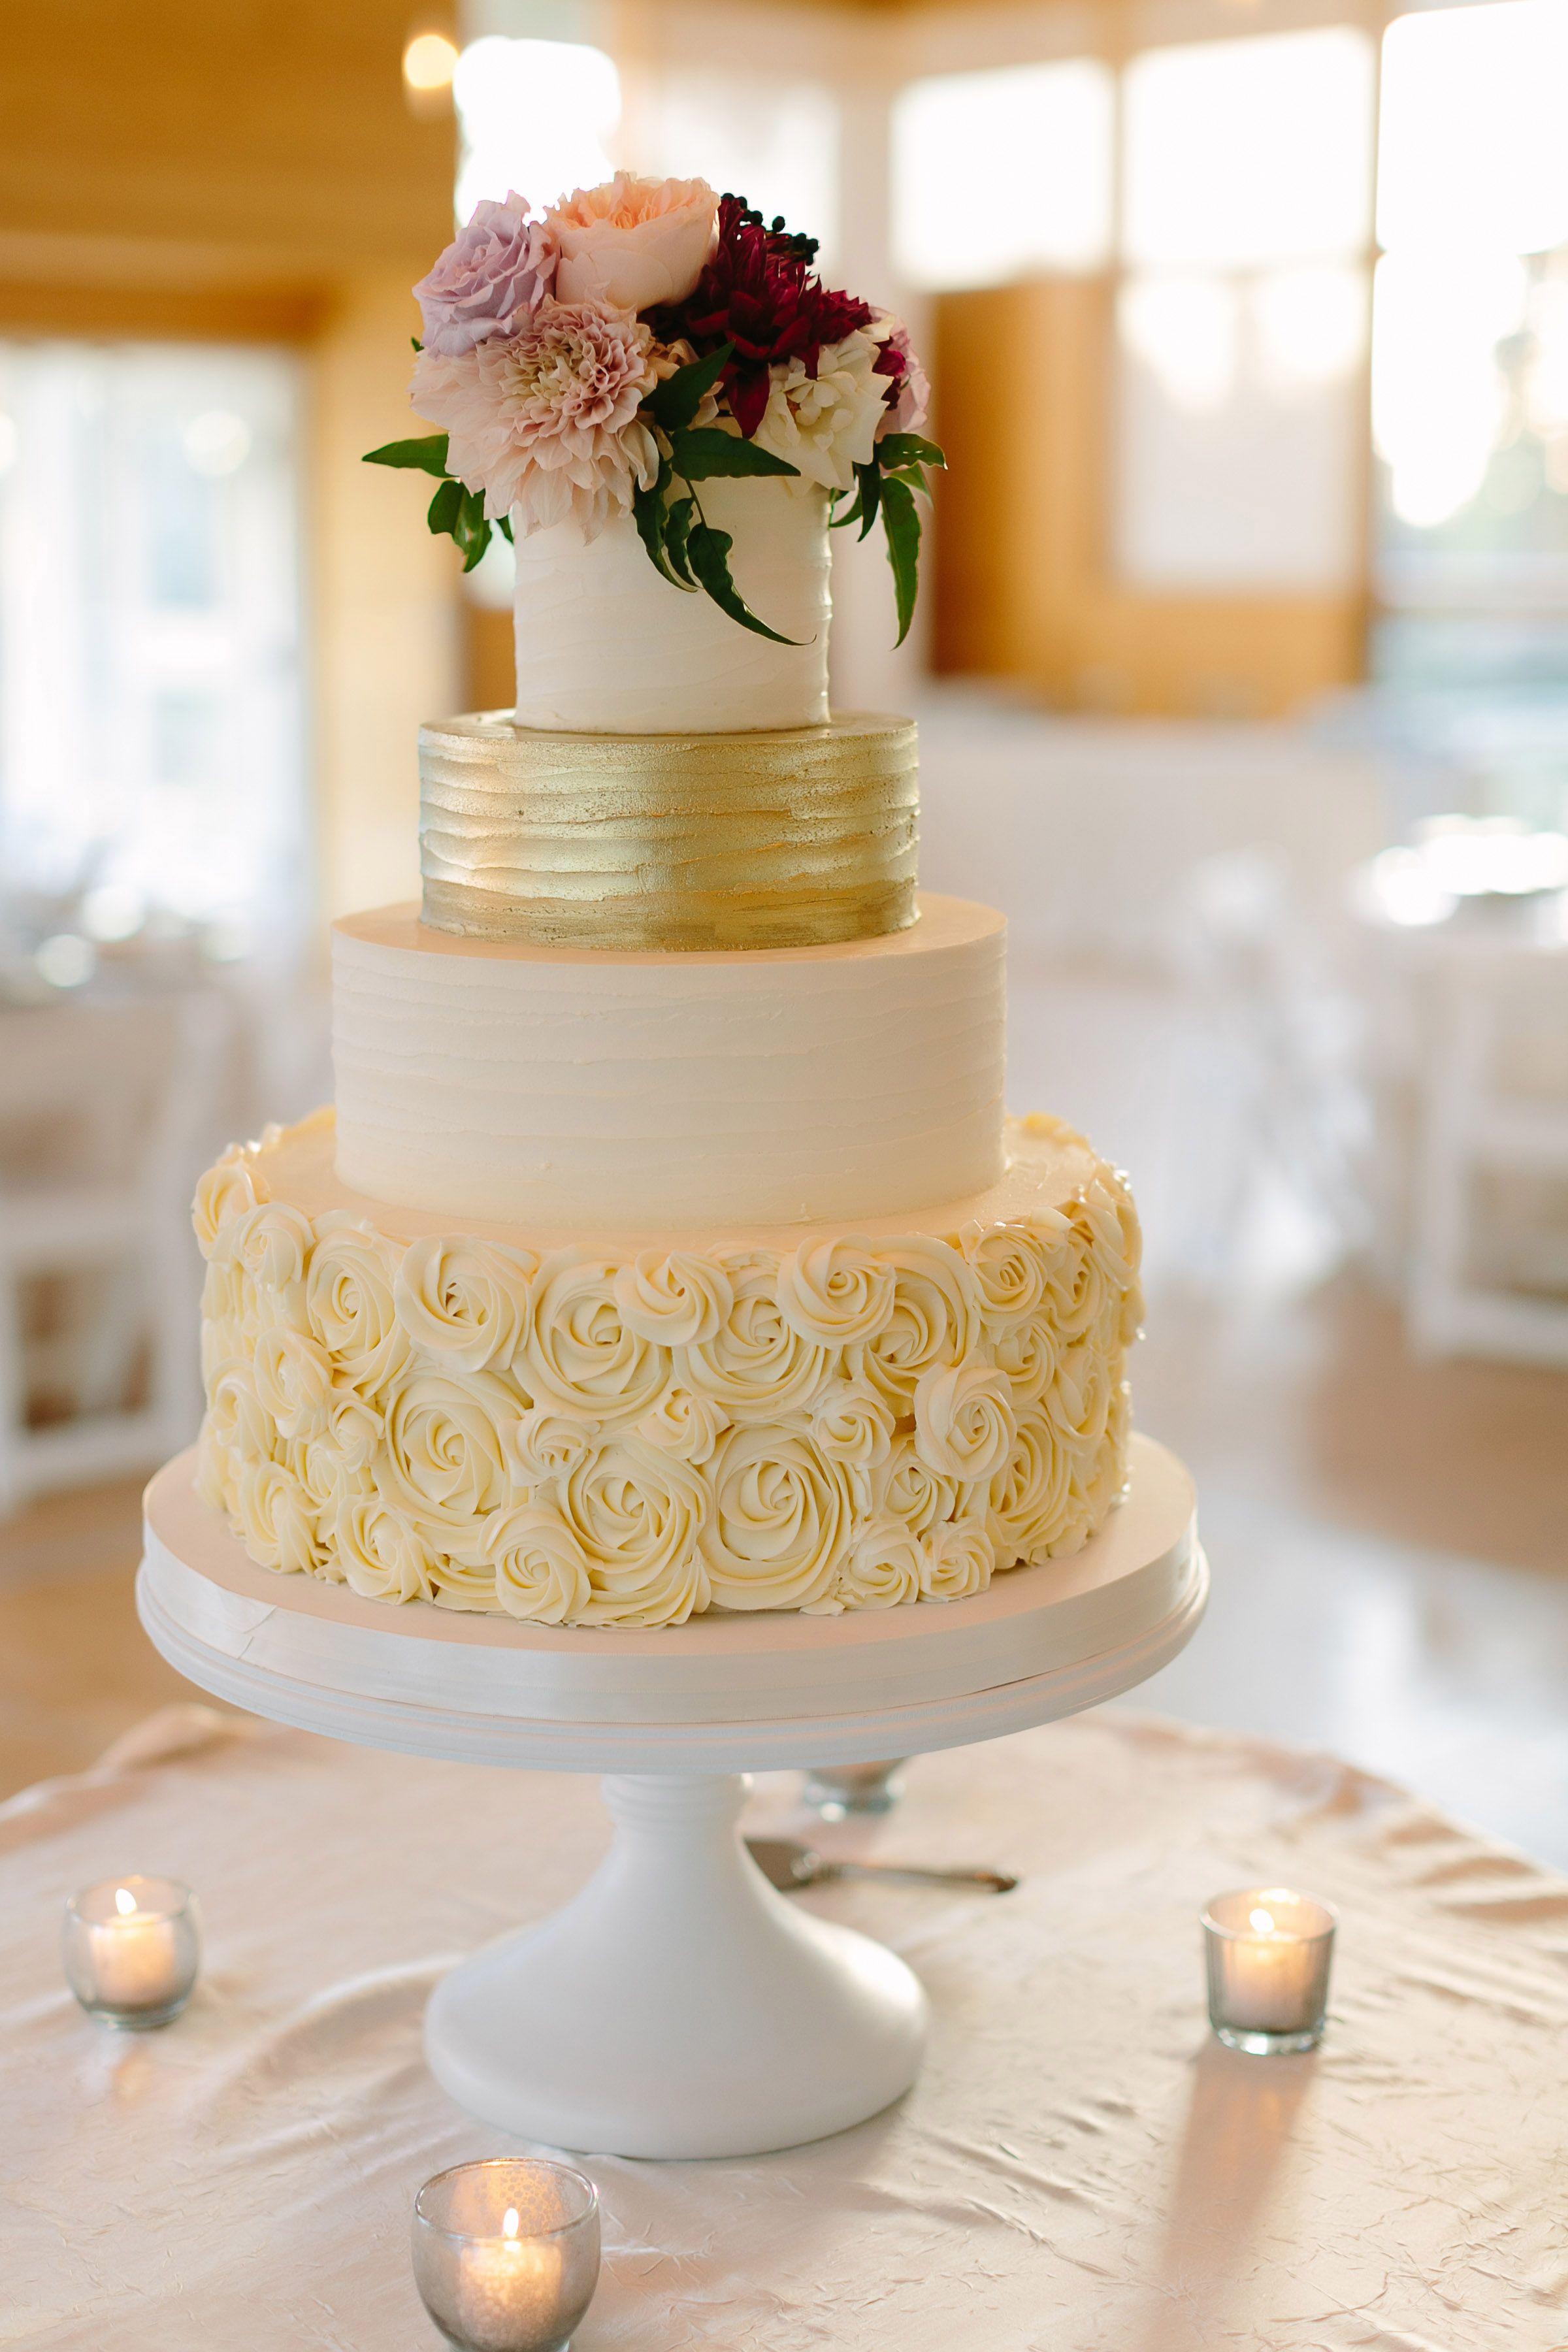 Amy Beck Cake Design Buttercream textured wedding cake | Photo ...